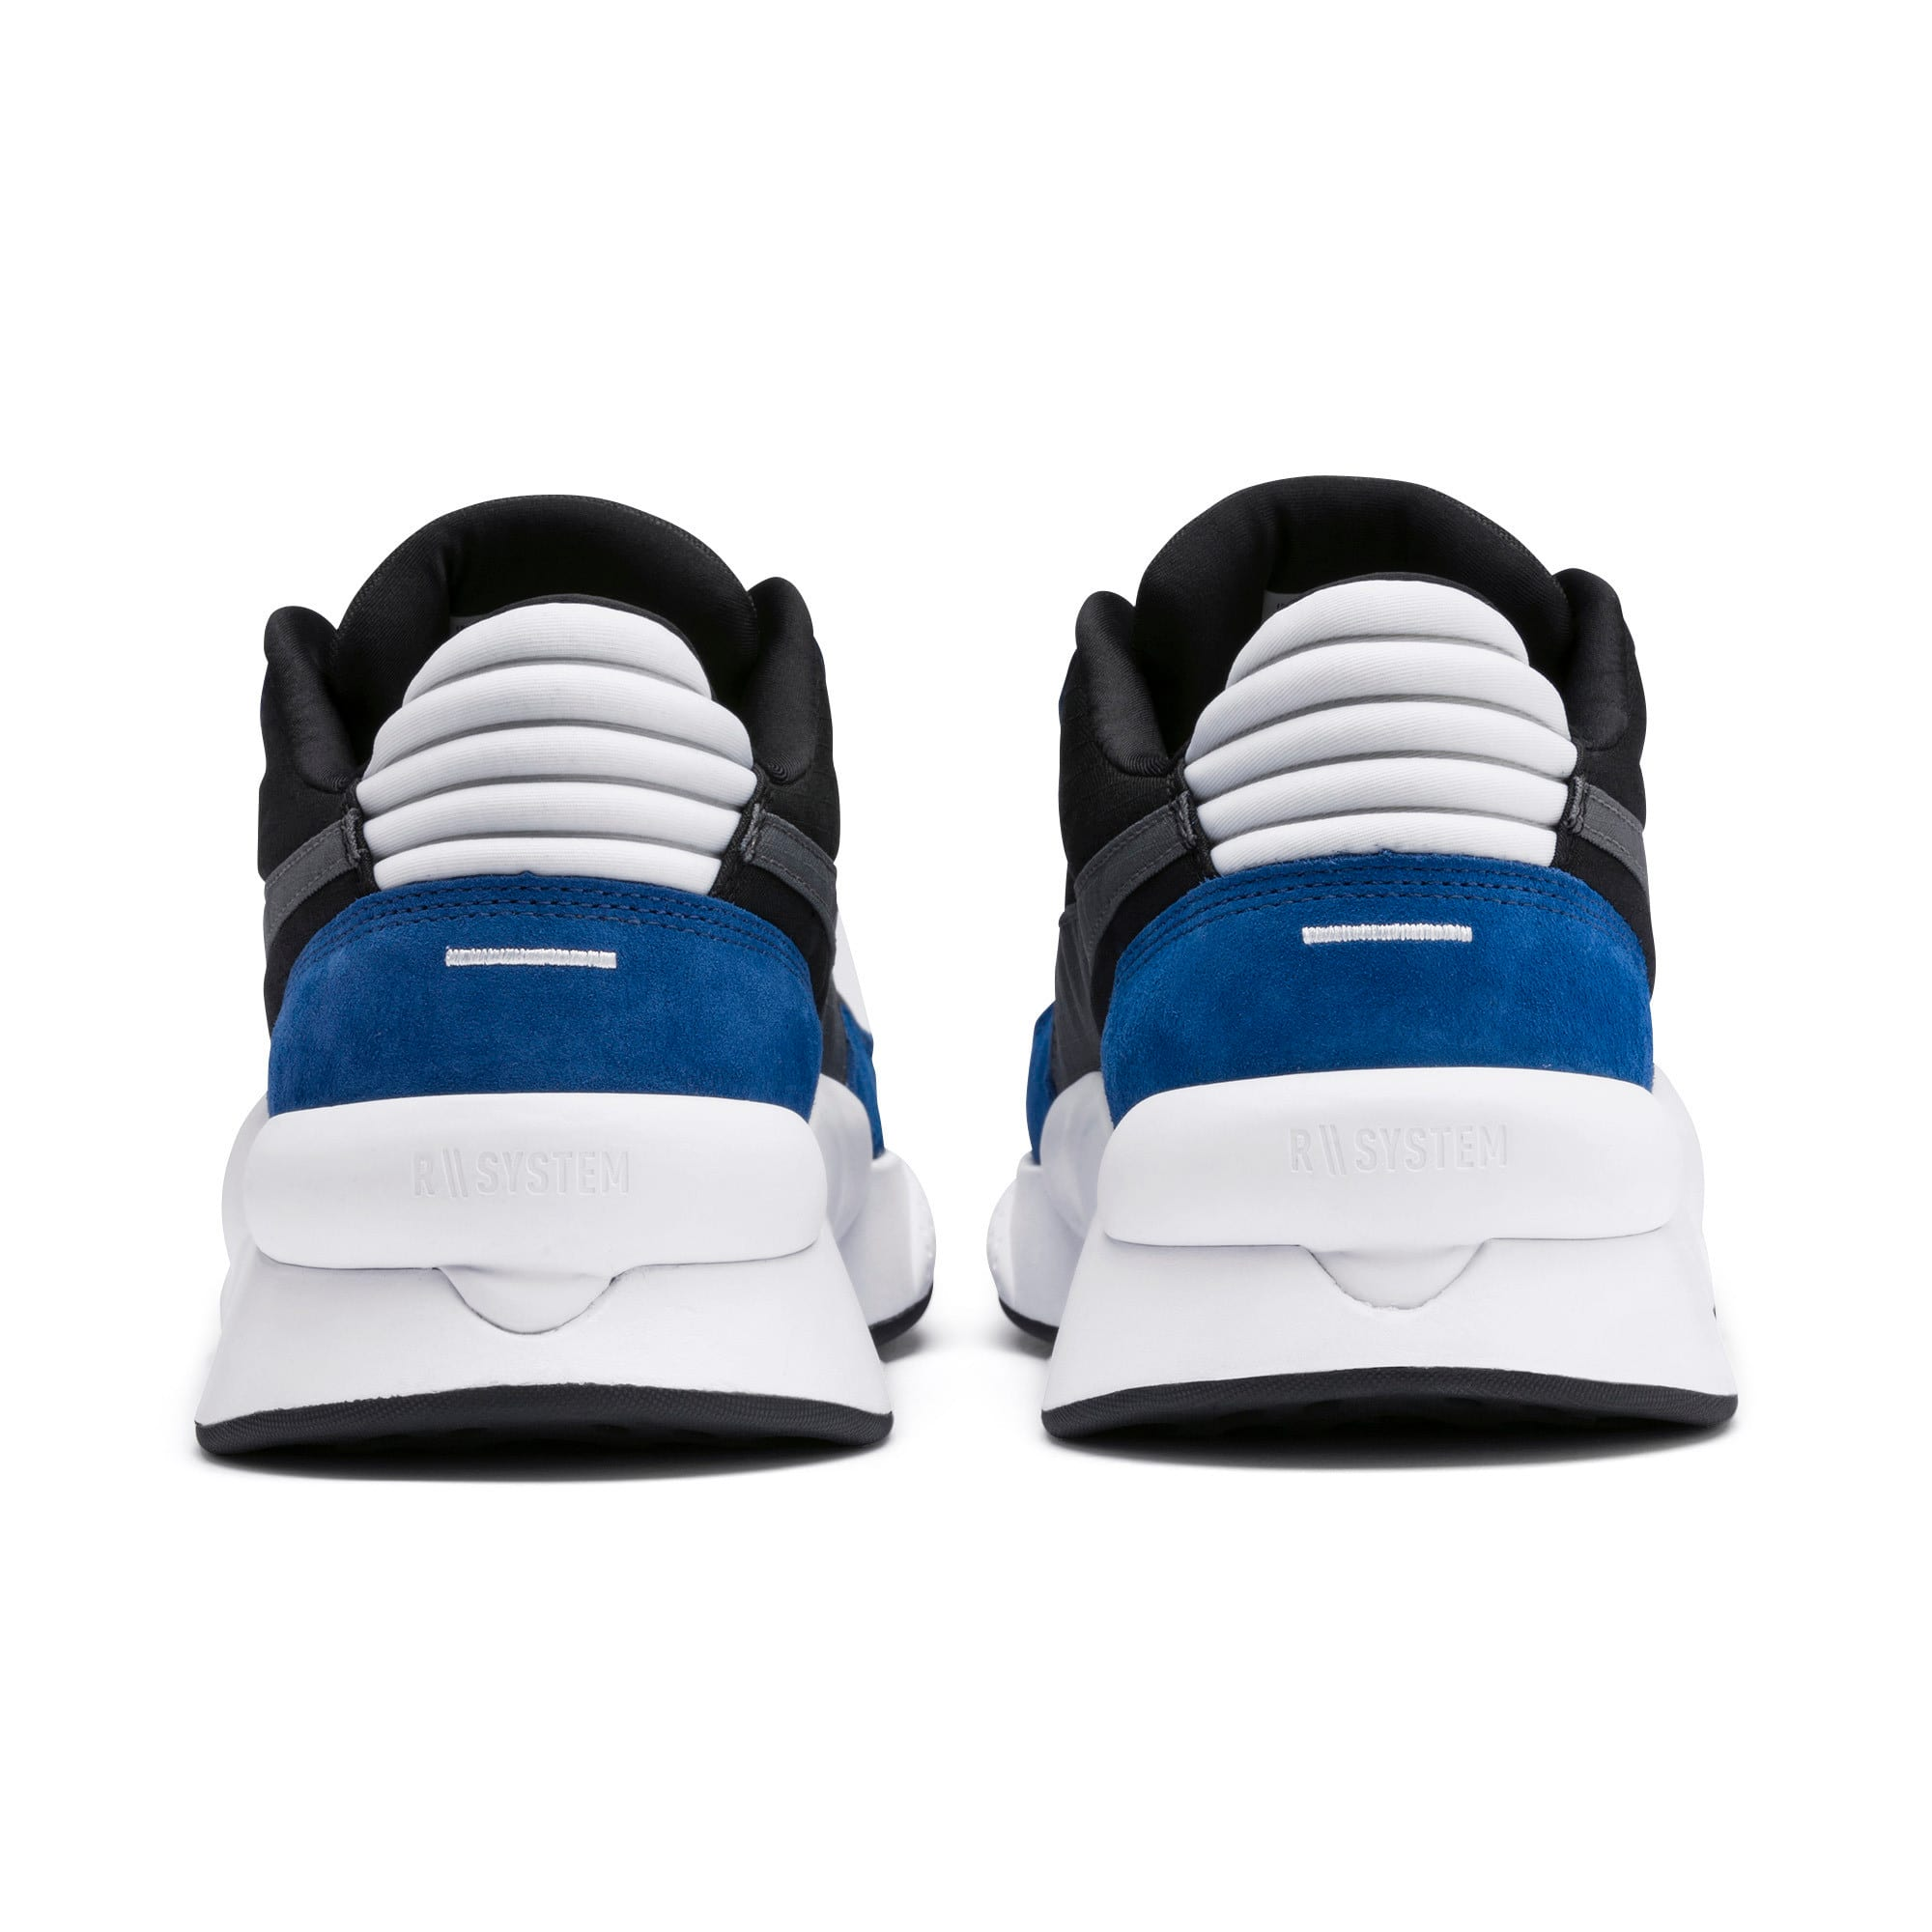 Thumbnail 3 of RS 9.8 Space Sneakers, Puma Black-Galaxy Blue, medium